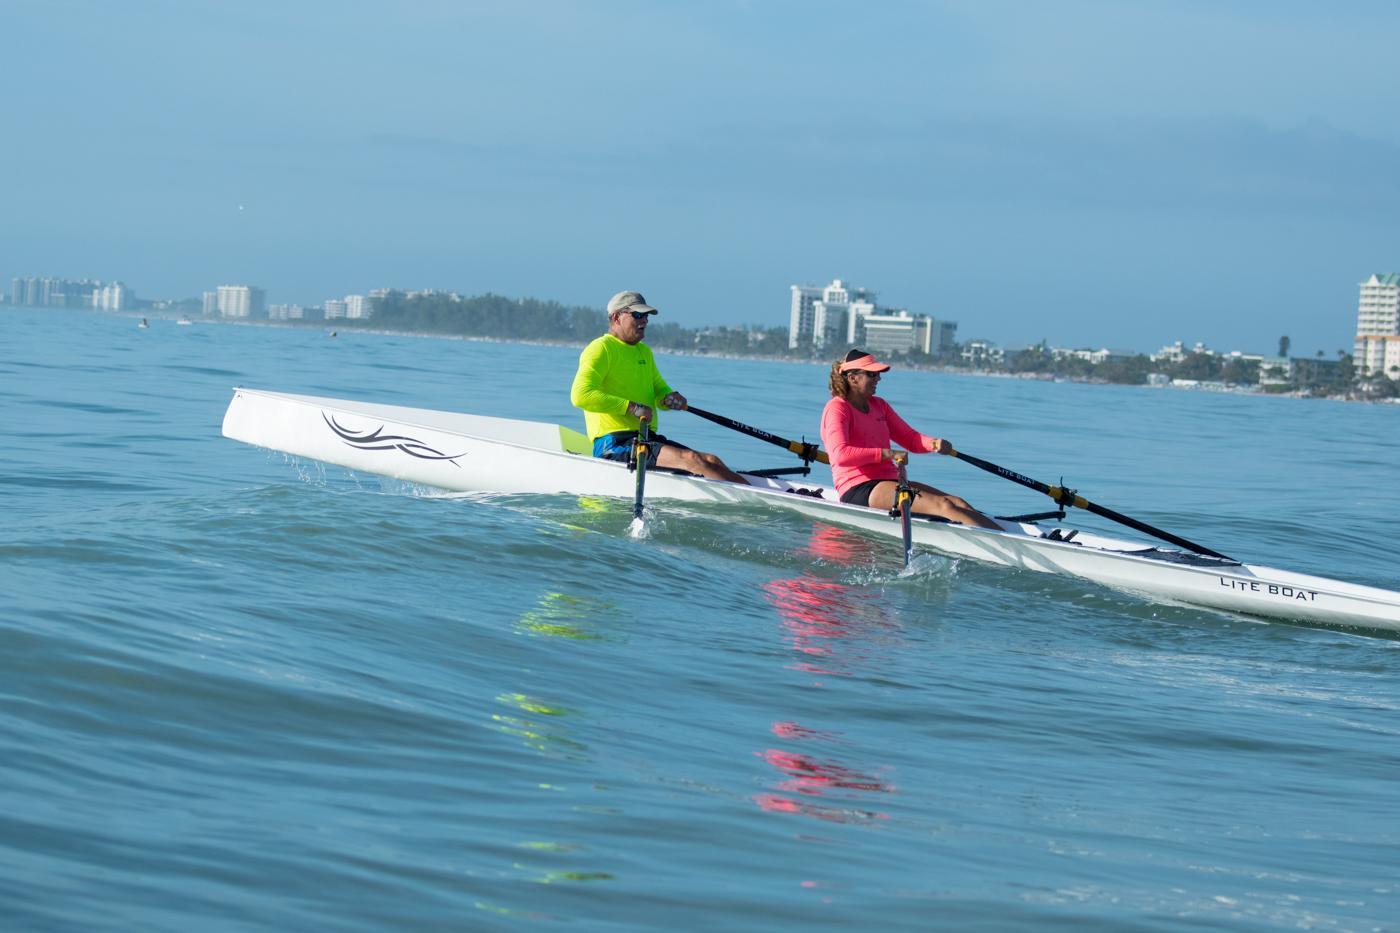 rowing_double-6.jpg